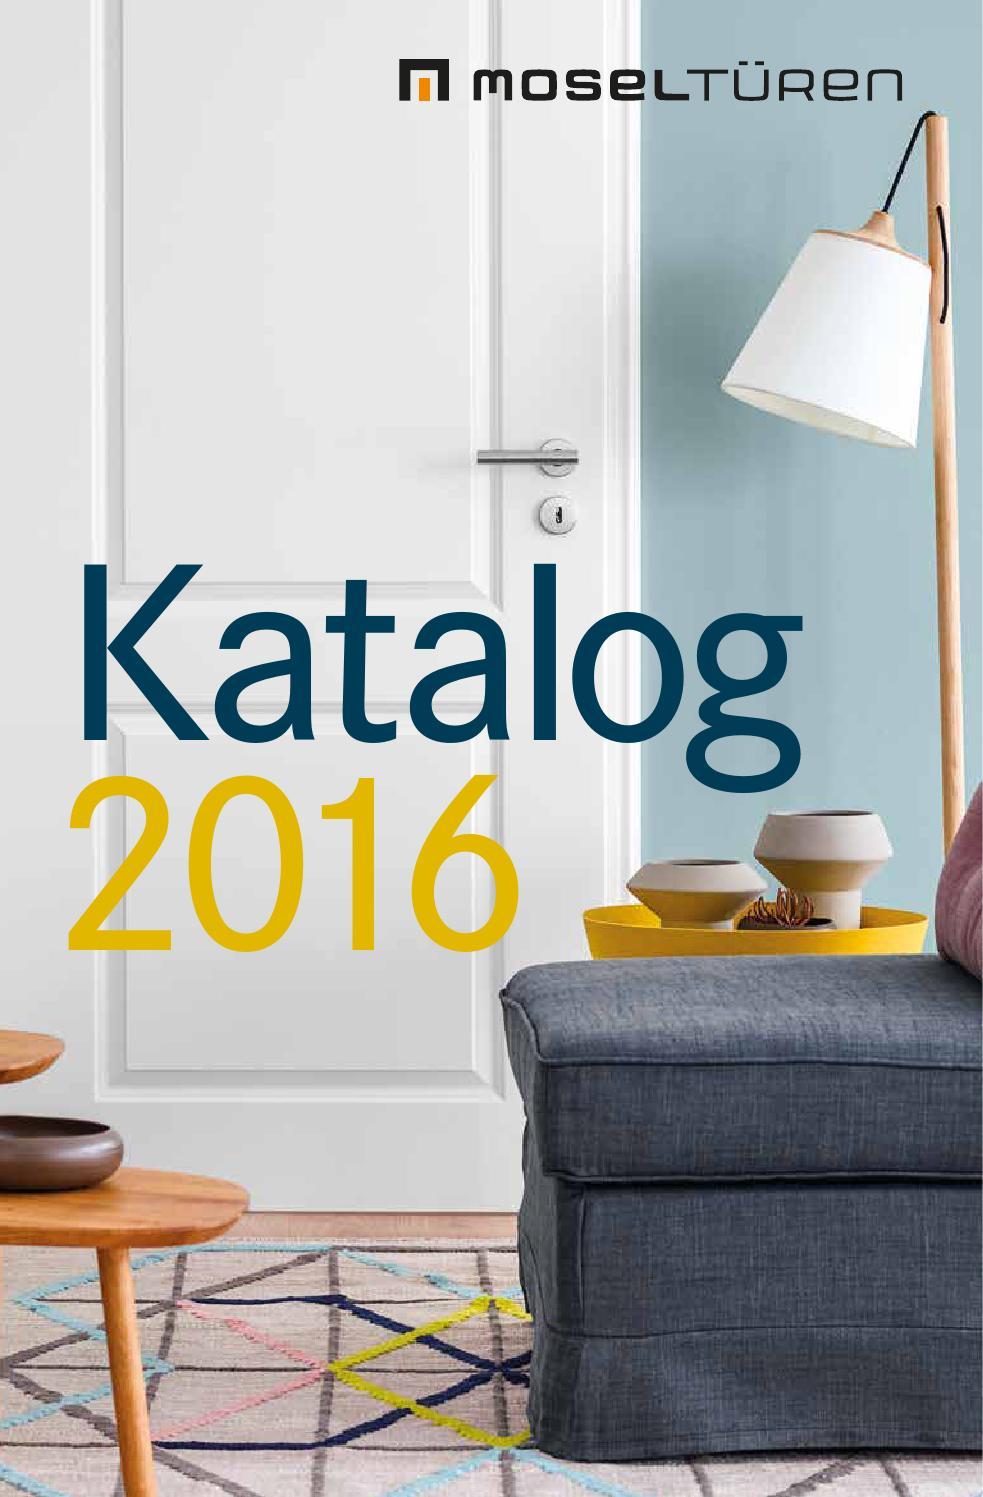 16 03 29 mt katalog2016 klein by gundolf riegg issuu. Black Bedroom Furniture Sets. Home Design Ideas